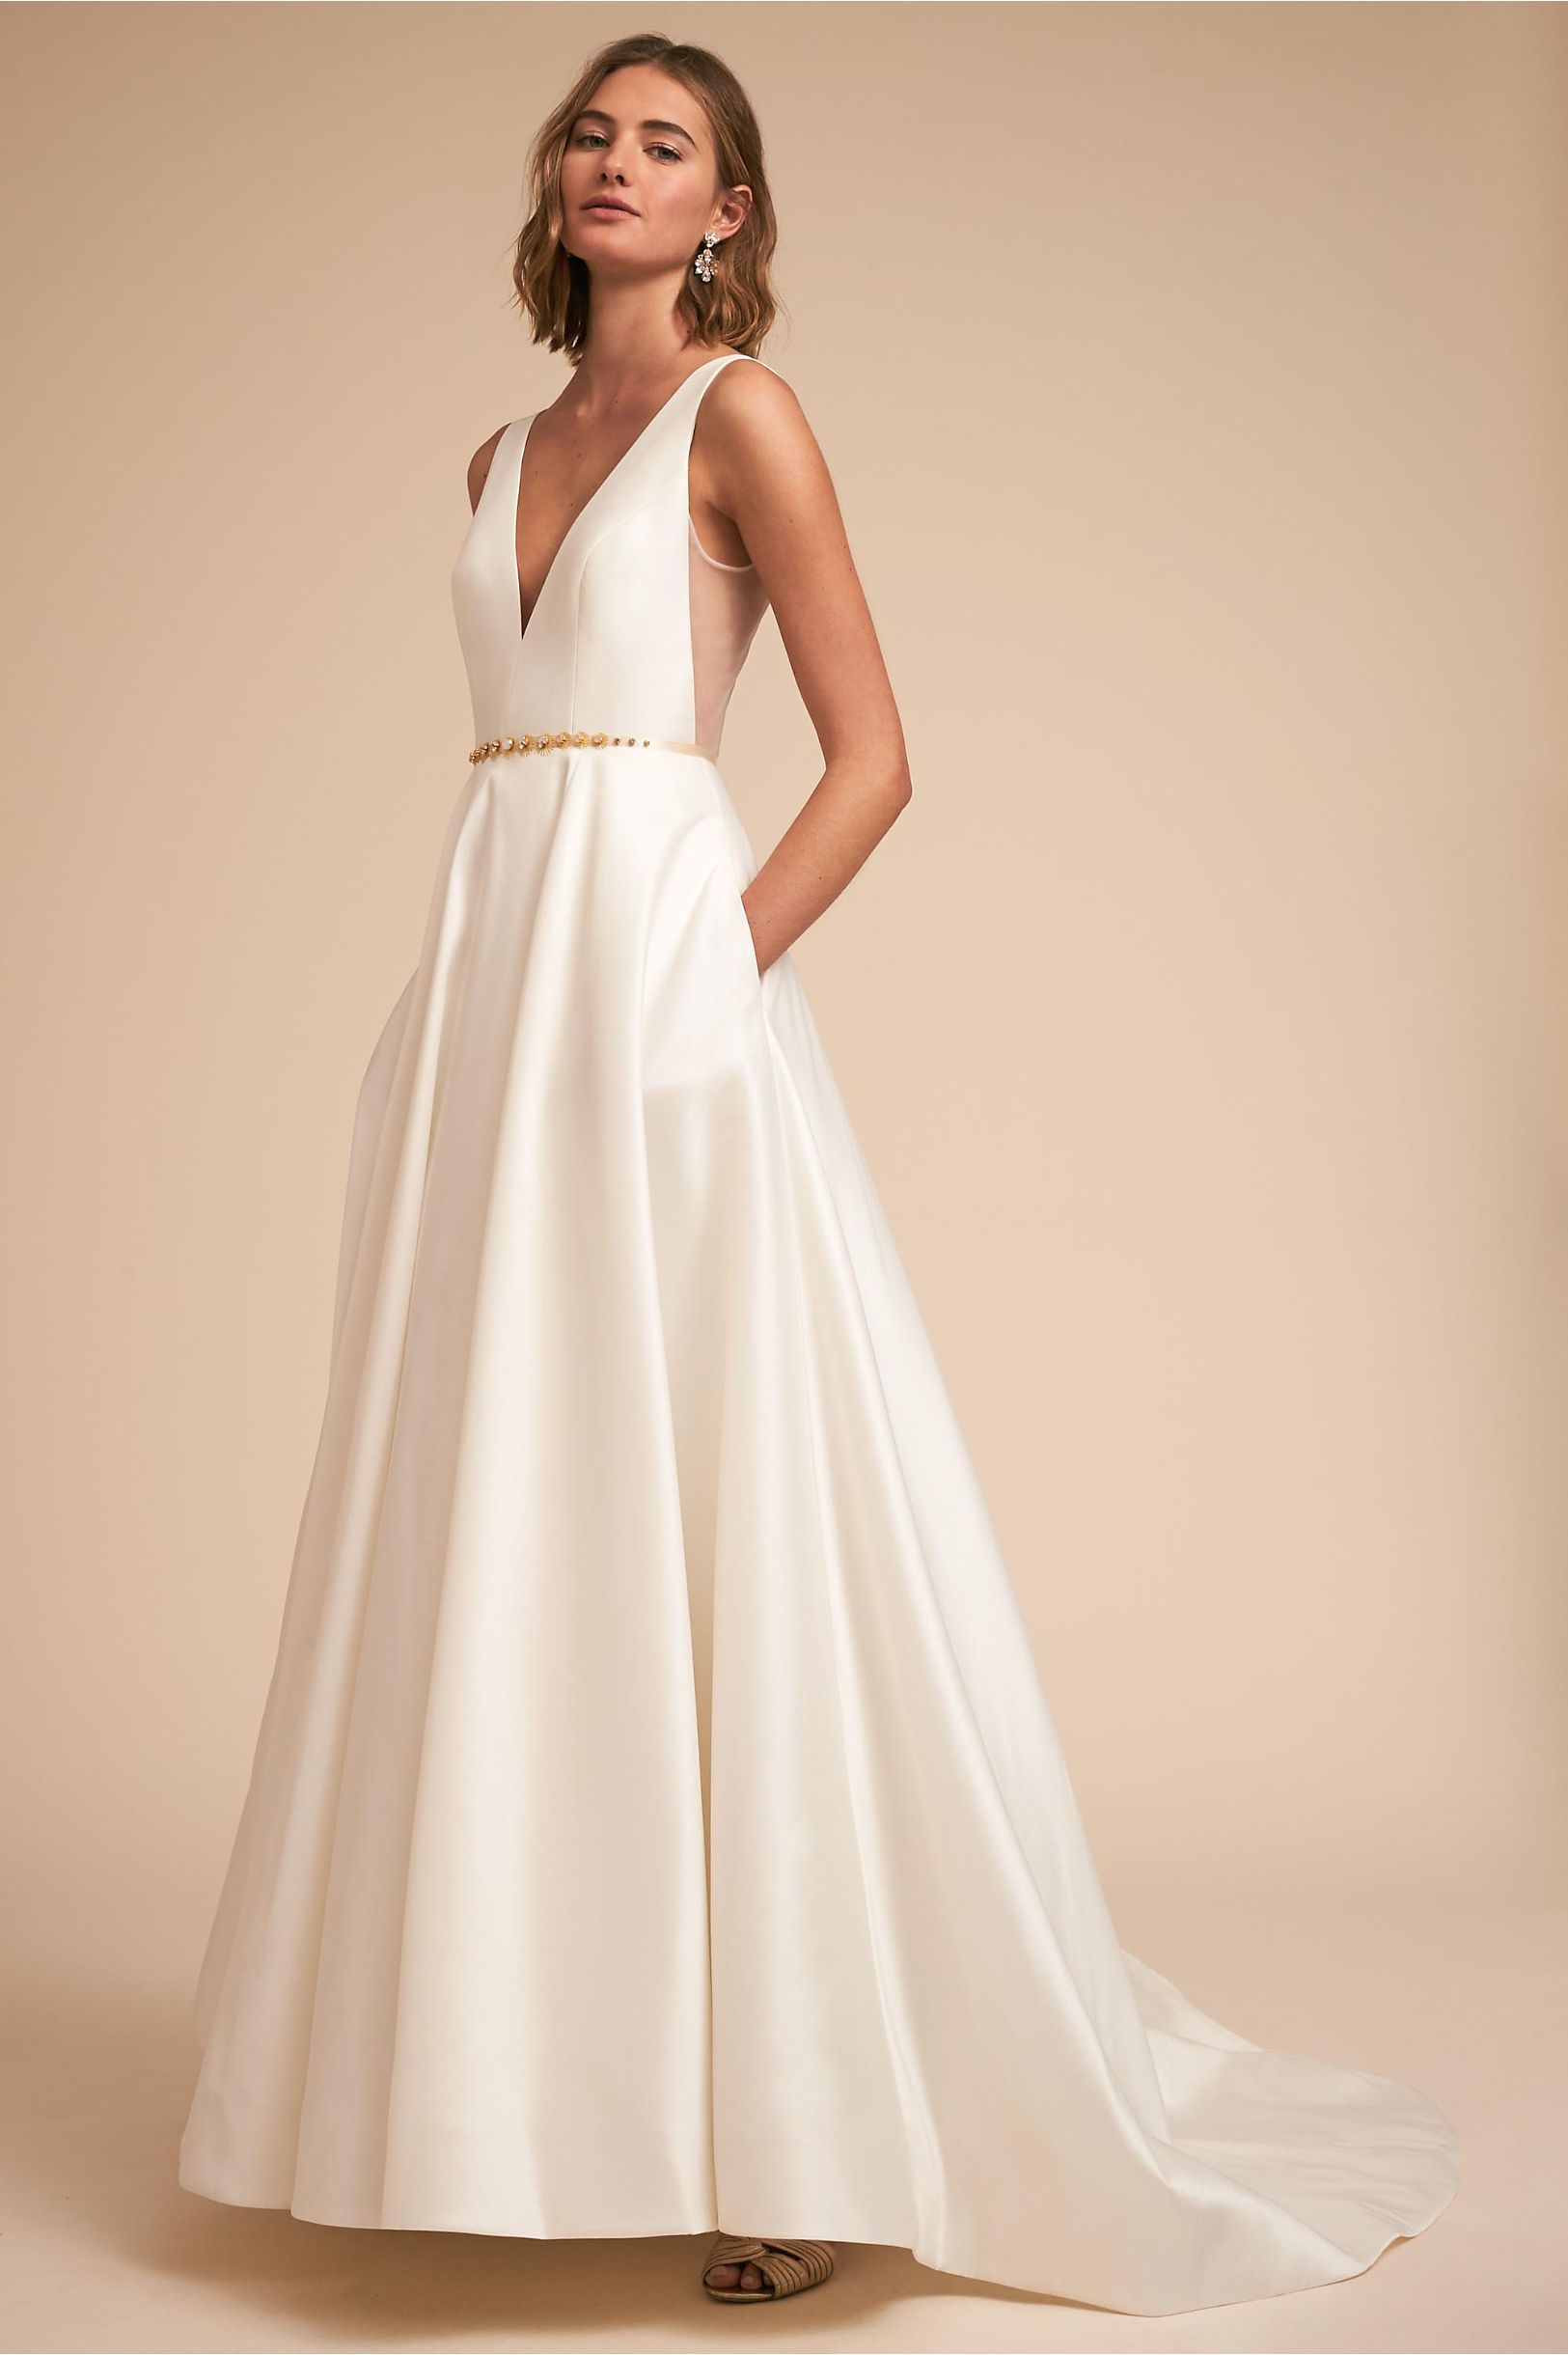 Lace button up wedding dress november 2018 BHLDN Octavia Gown Ivory in New  BHLDN  Weddings  Pinterest